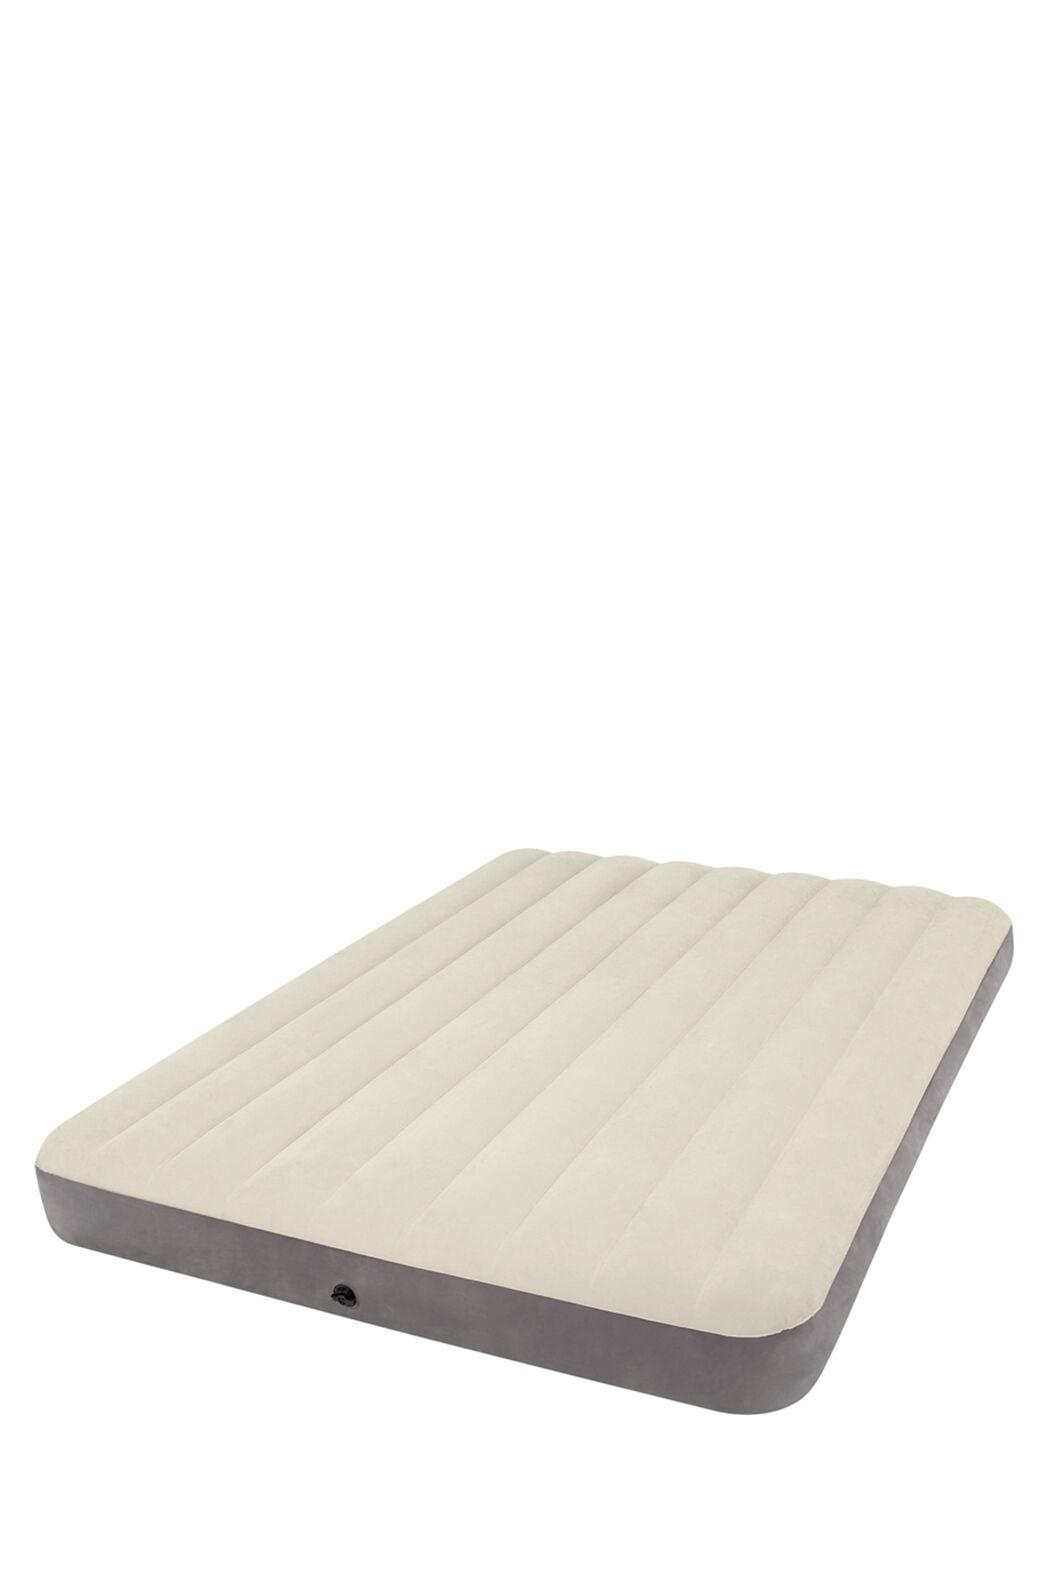 Intex Queen Deluxe Dura-Beam Air Bed, None, hi-res